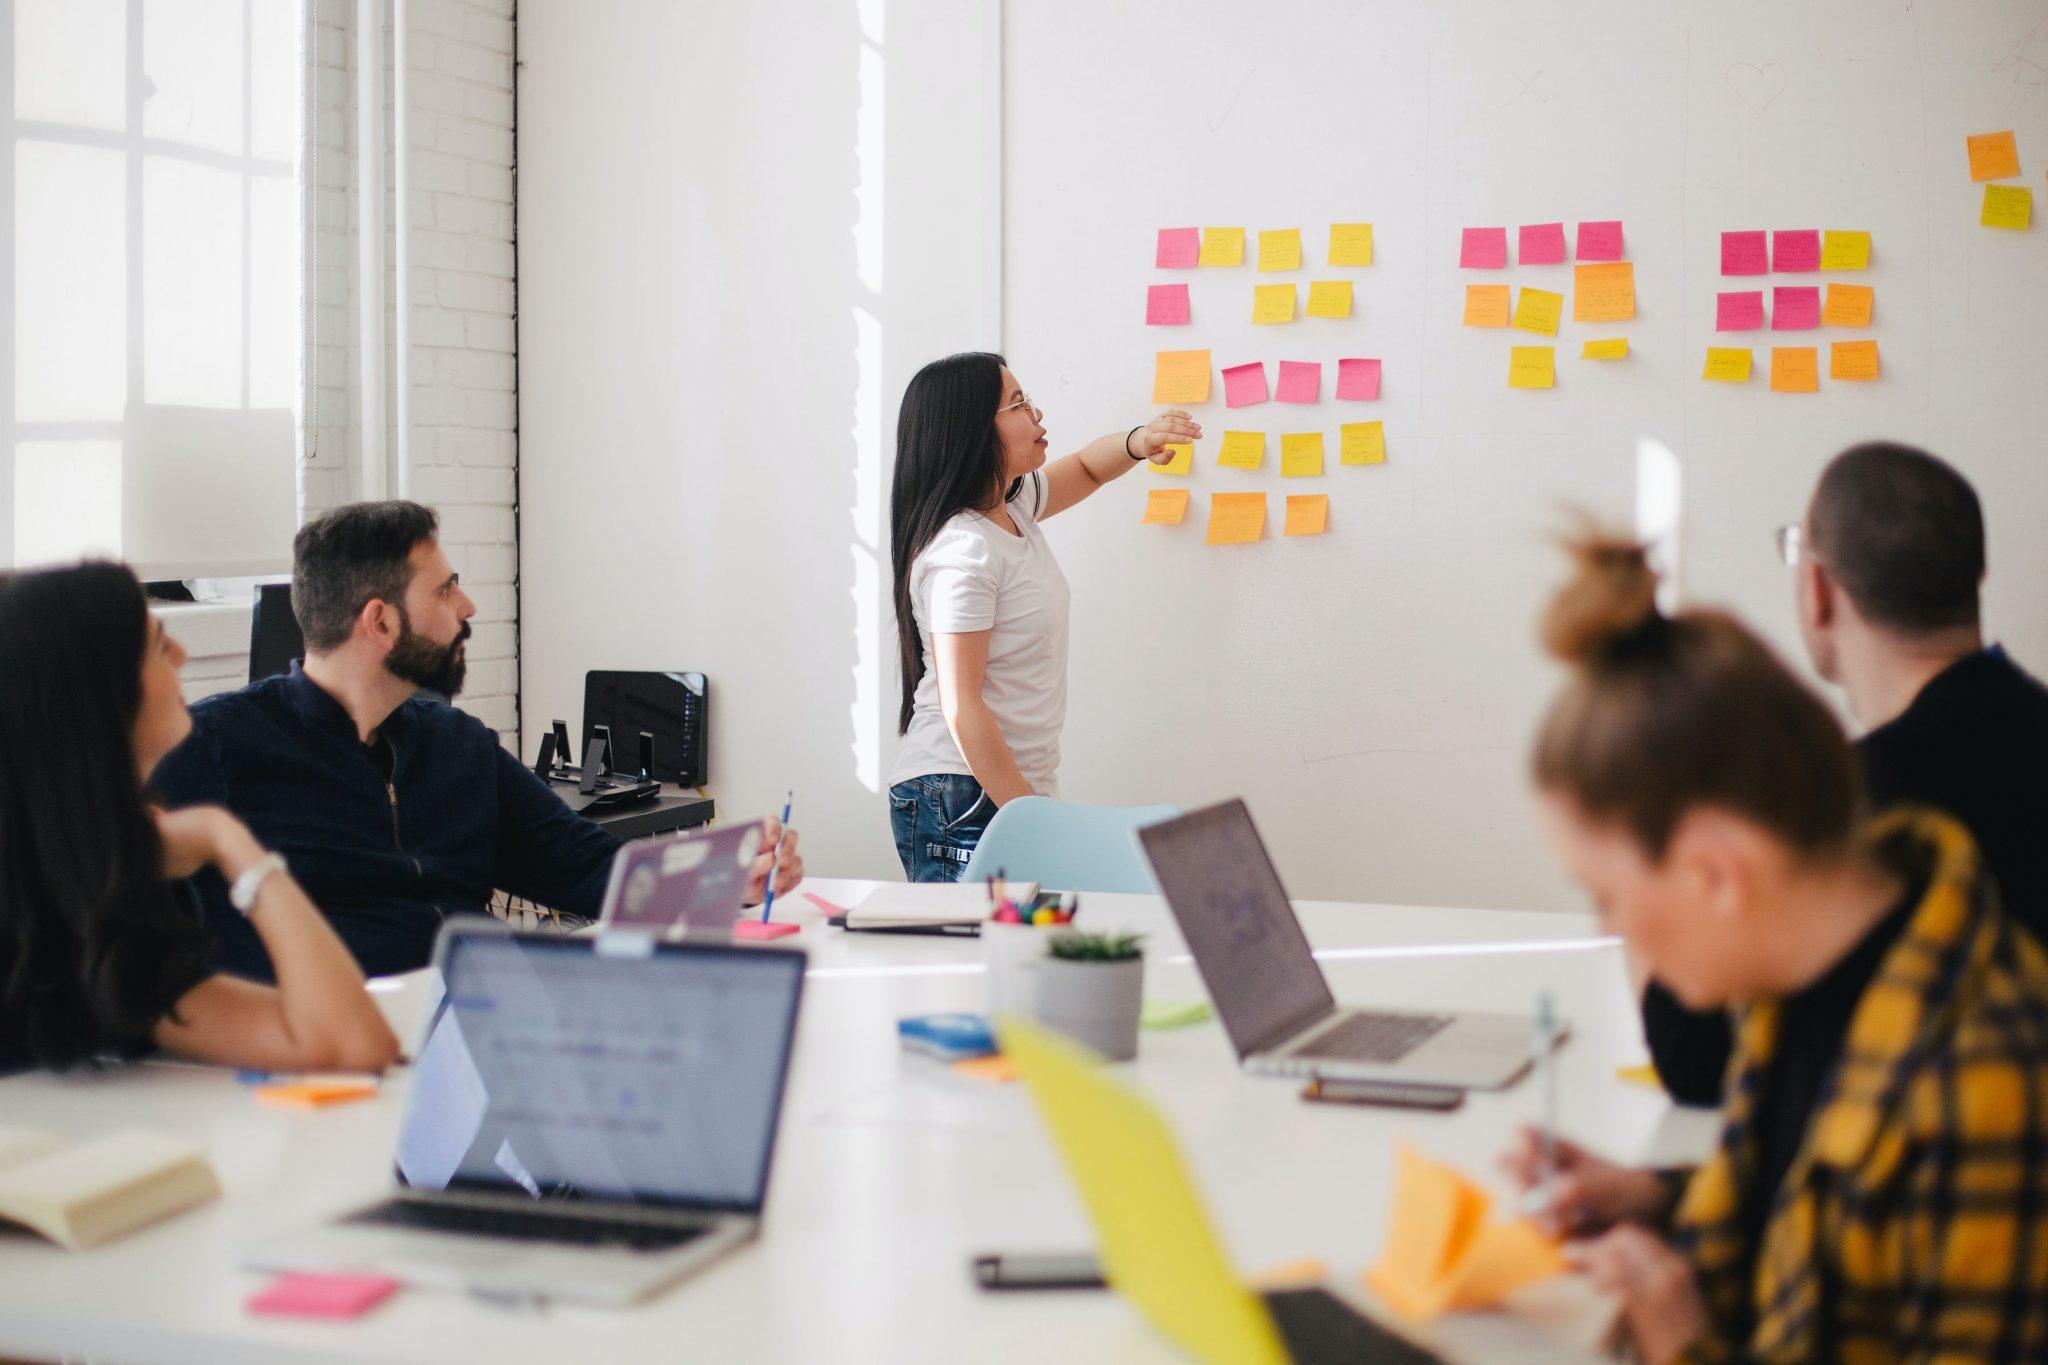 La struttura a 12 punti di una campagna di comunicazione e marketing